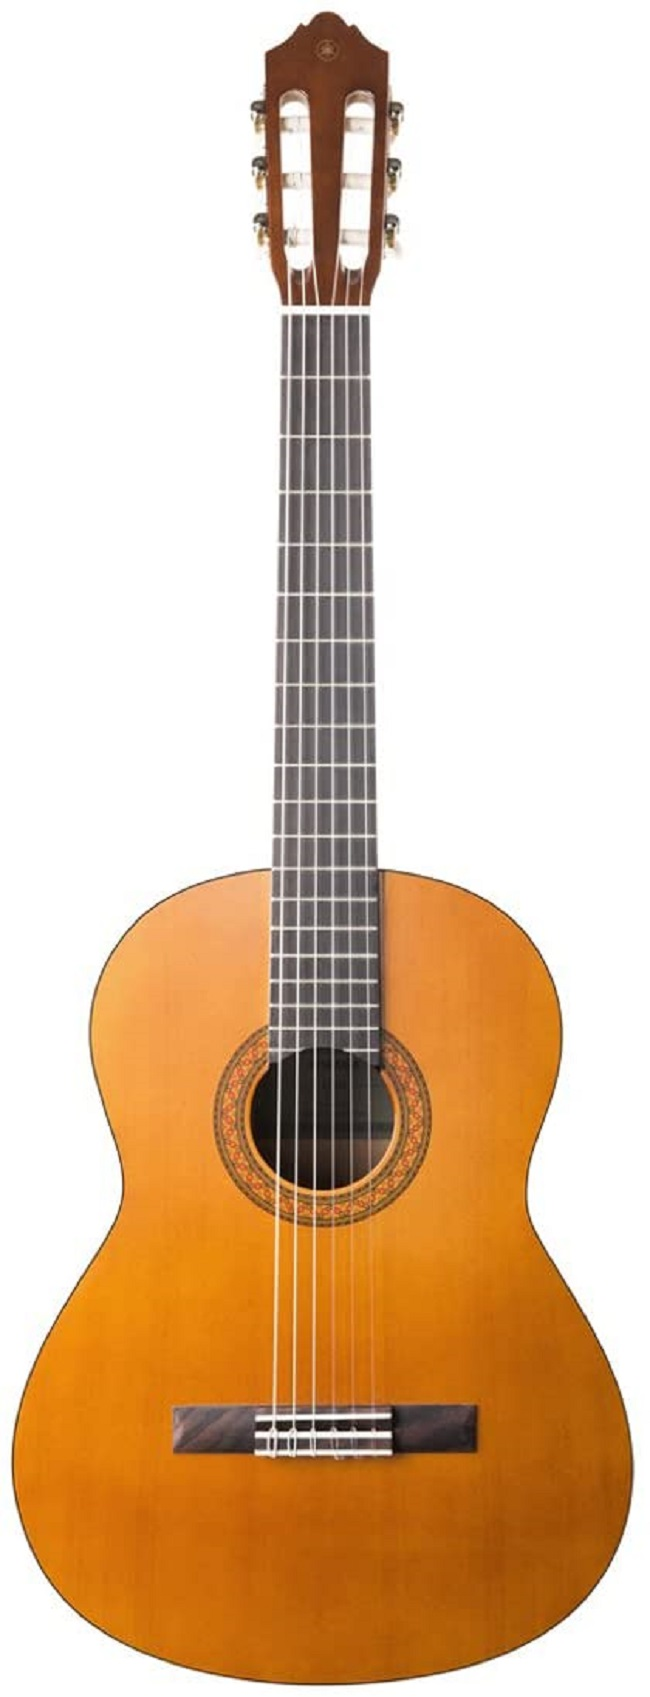 descripcion guitarra yamaha